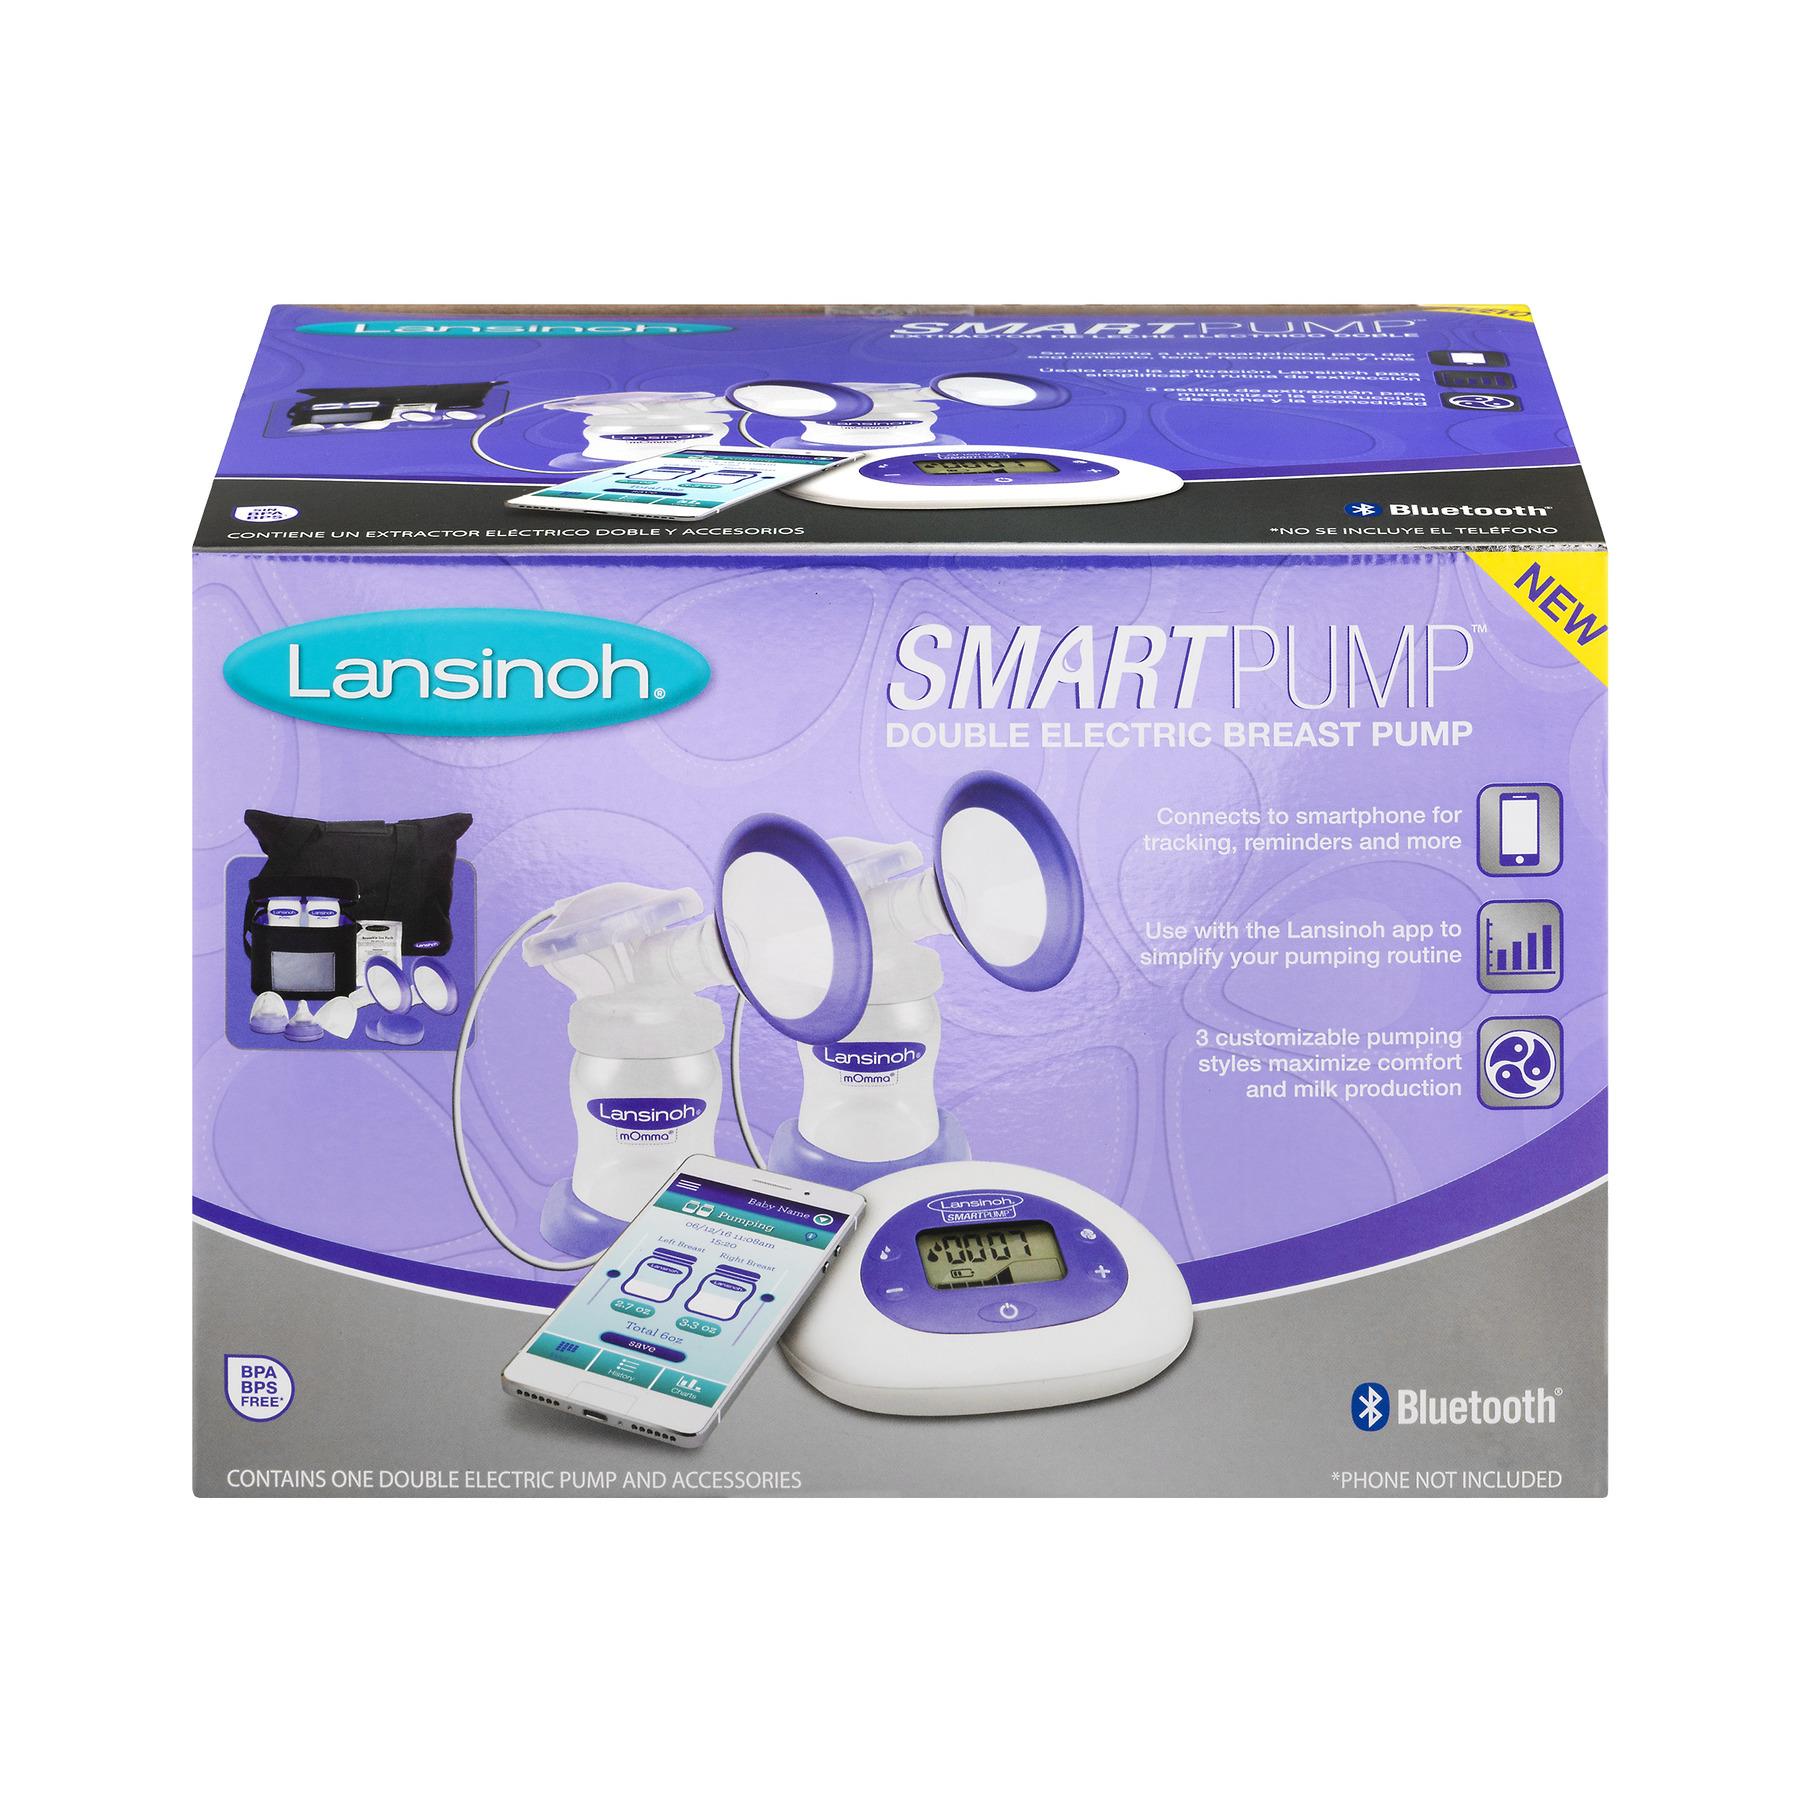 Lansinoh Smartpump Double Electric Breast Pump by Lansinoh